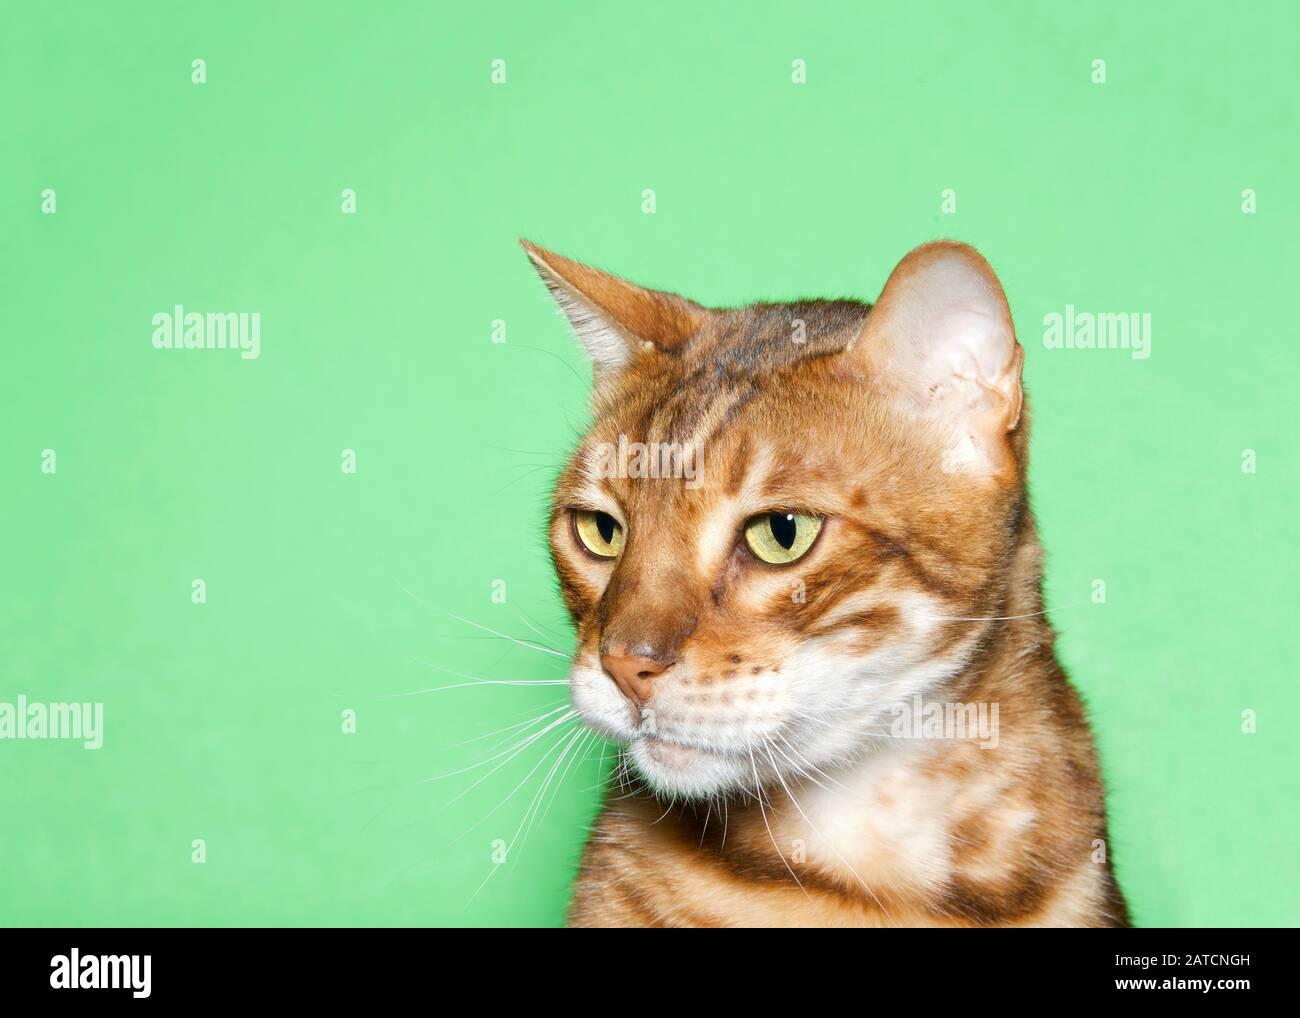 Primer plano retrato de un adorable gato naranja y marrón Bengala mirando a los espectadores con curiosa expresión. Fondo verde con espacio de copia Foto de stock